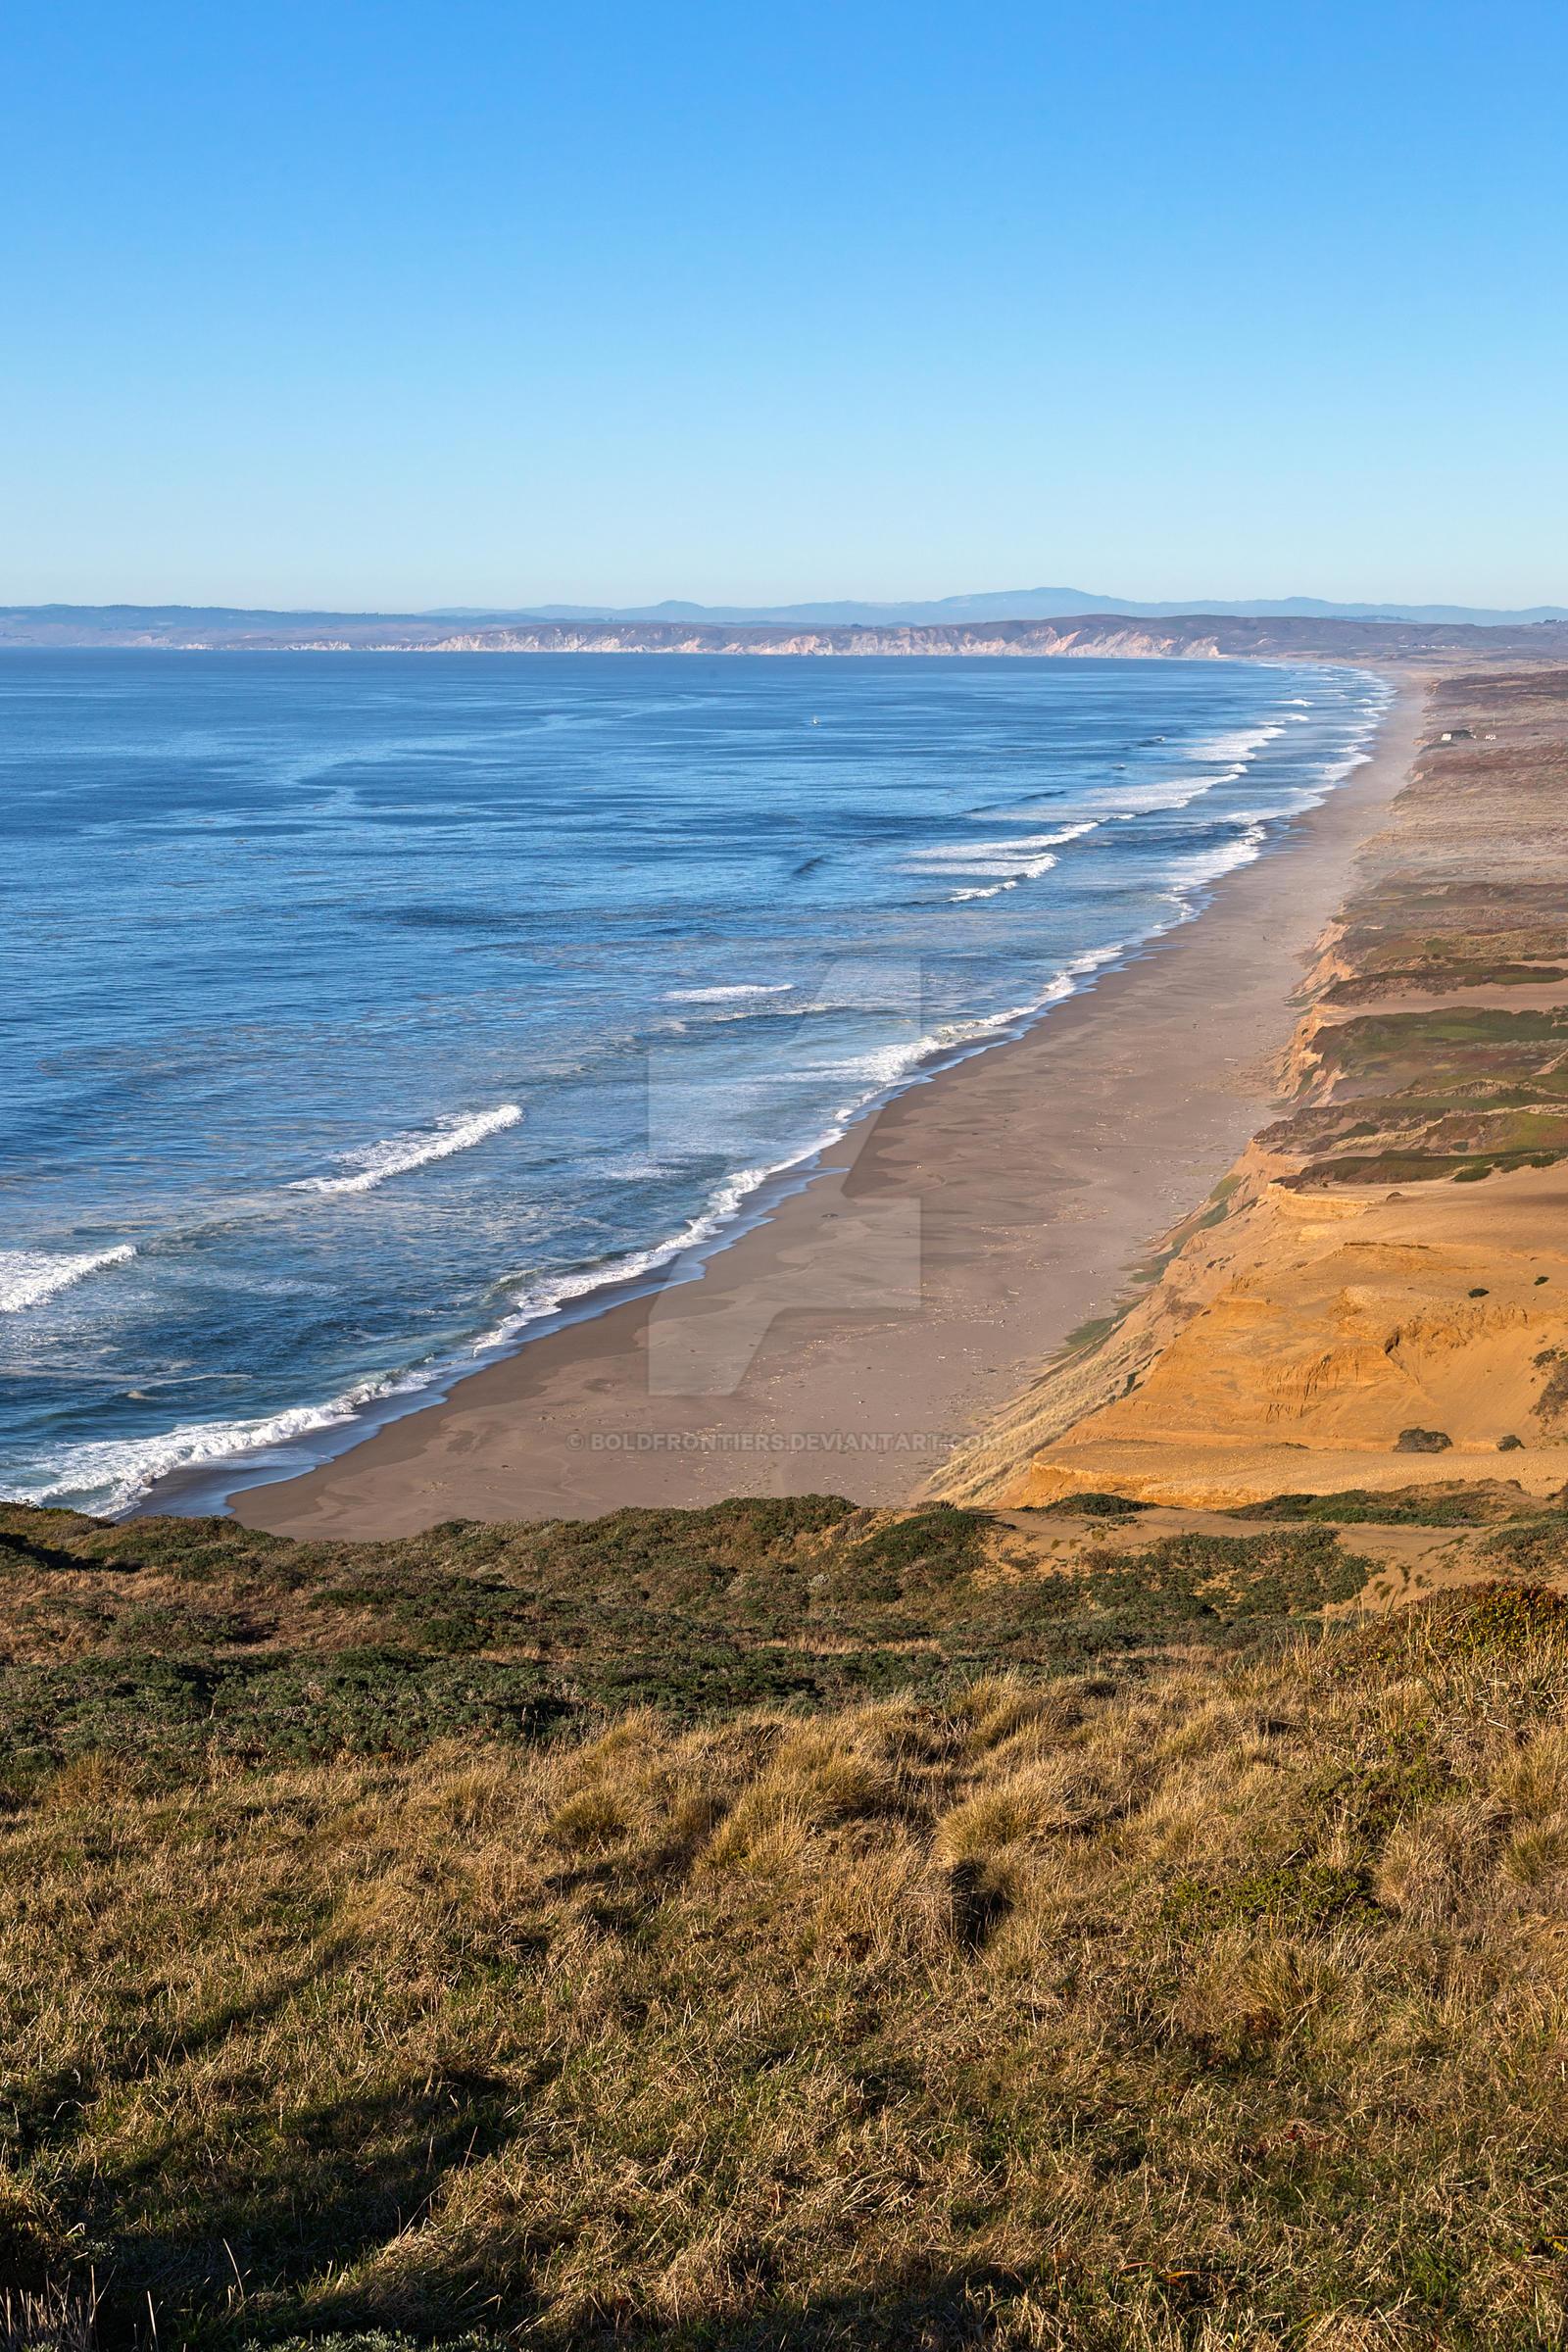 Point Reyes Coast II - Exclusive HDR Stock by somadjinn